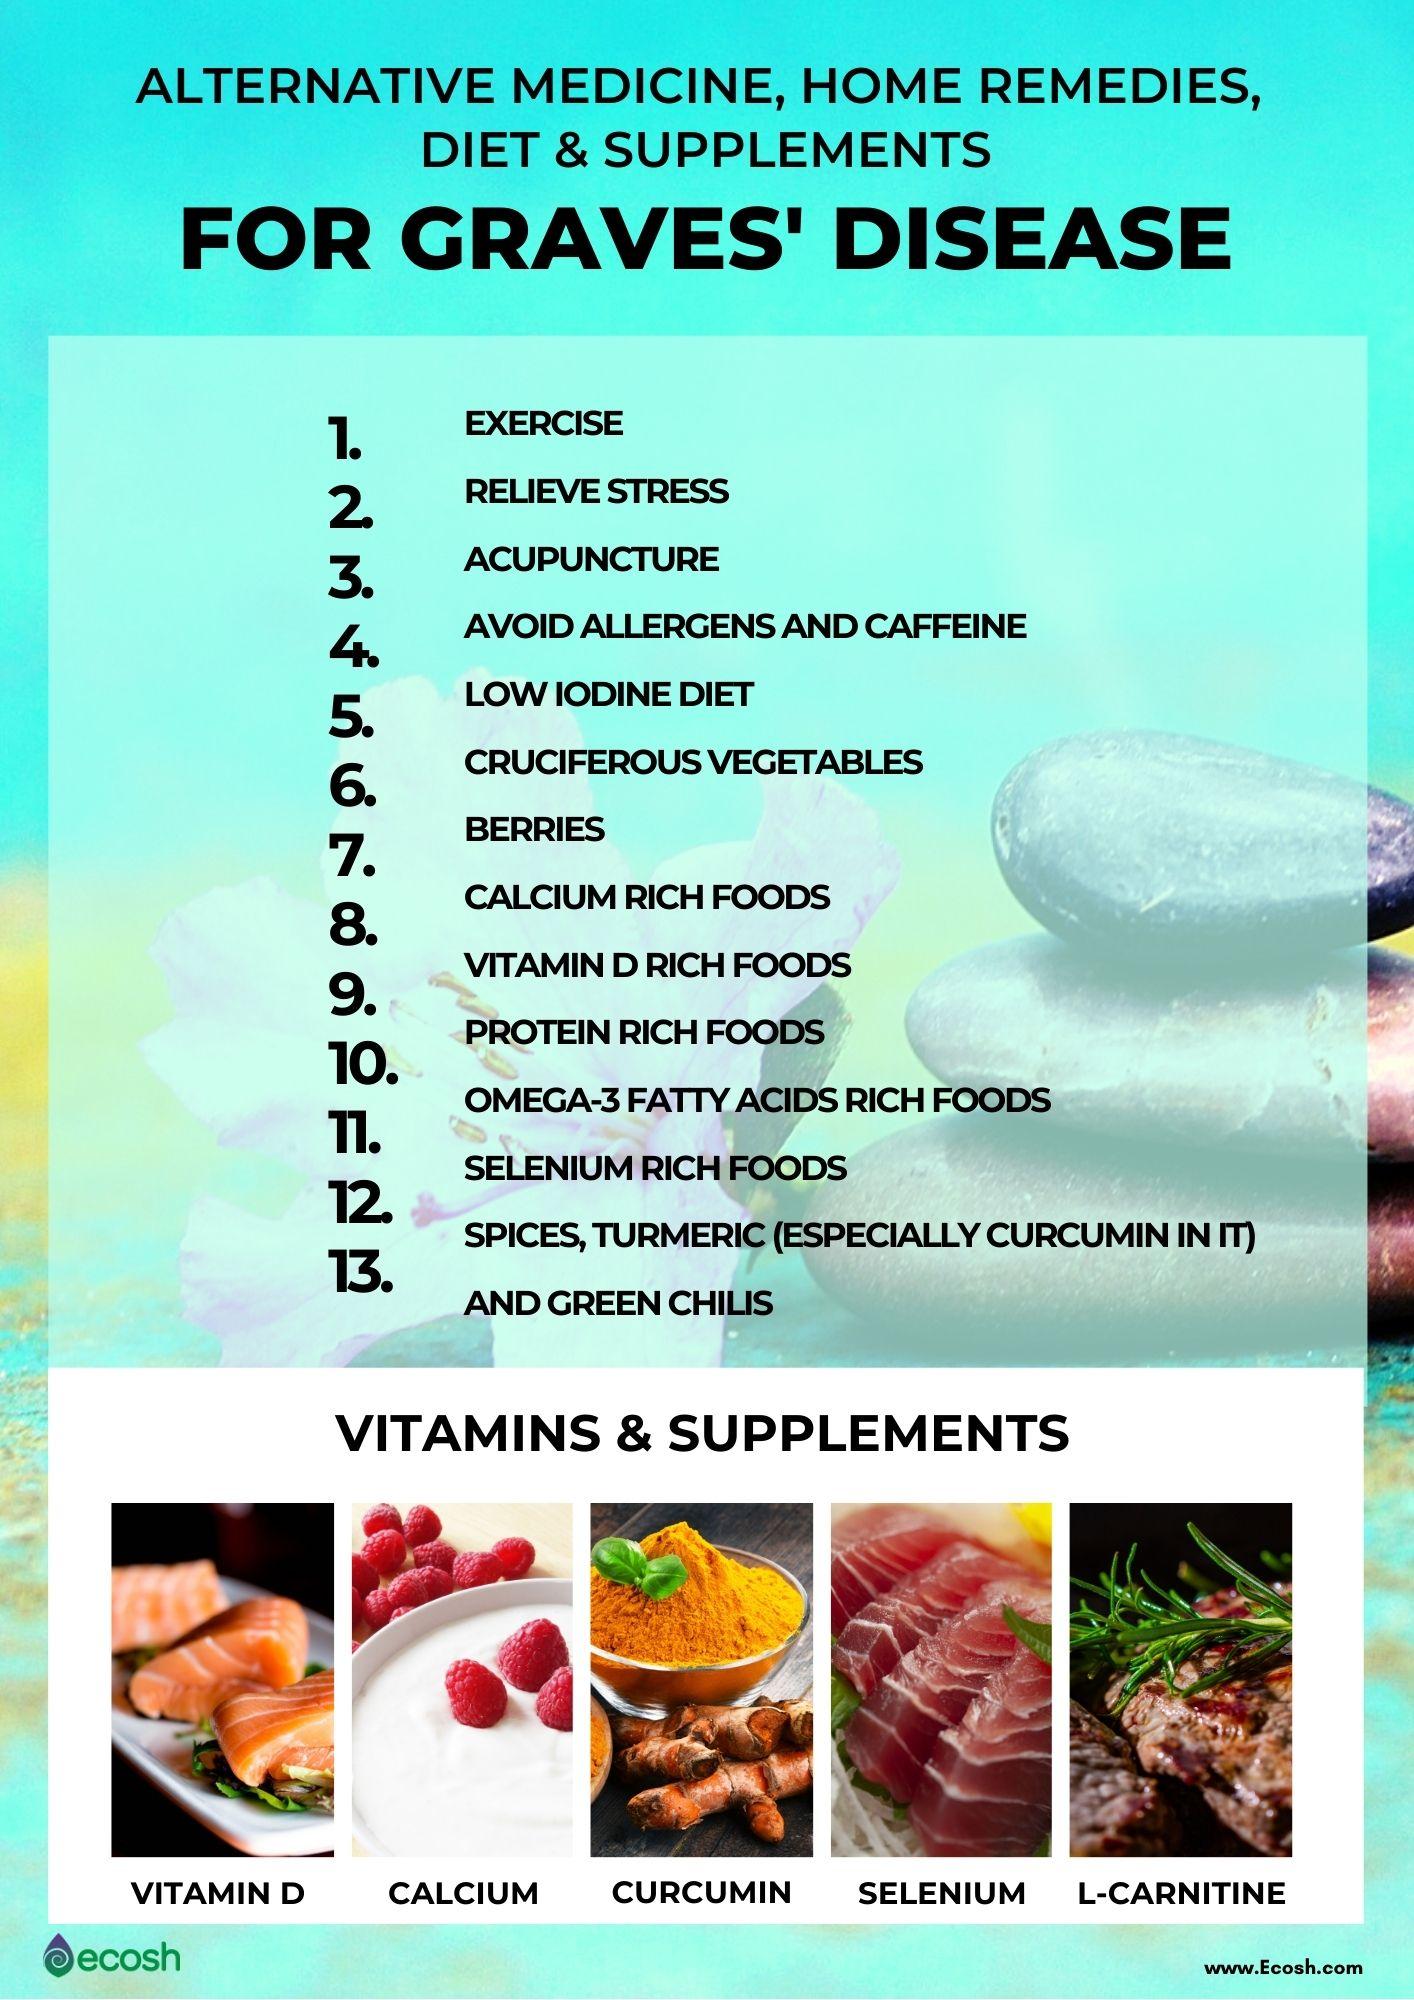 Alternative_Medicine_For_Graves_Disease_Home_Remedies_for_Graves_Disease_Graves_Disease_Diet_Supplements_for_Graves_Disease